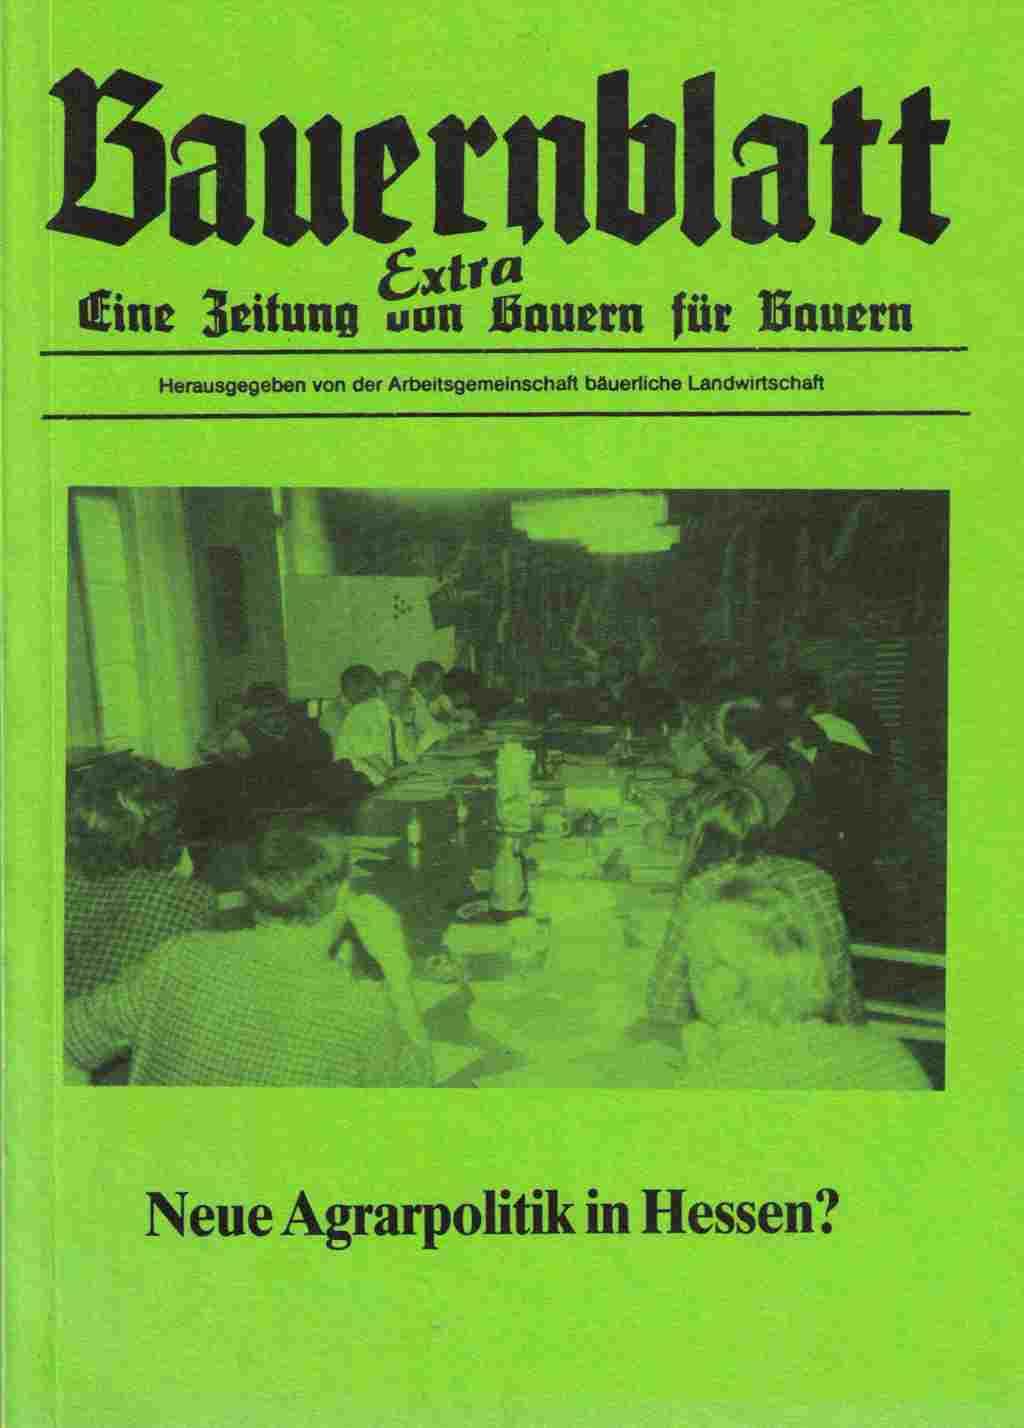 Bauernblatt Extra Hessen